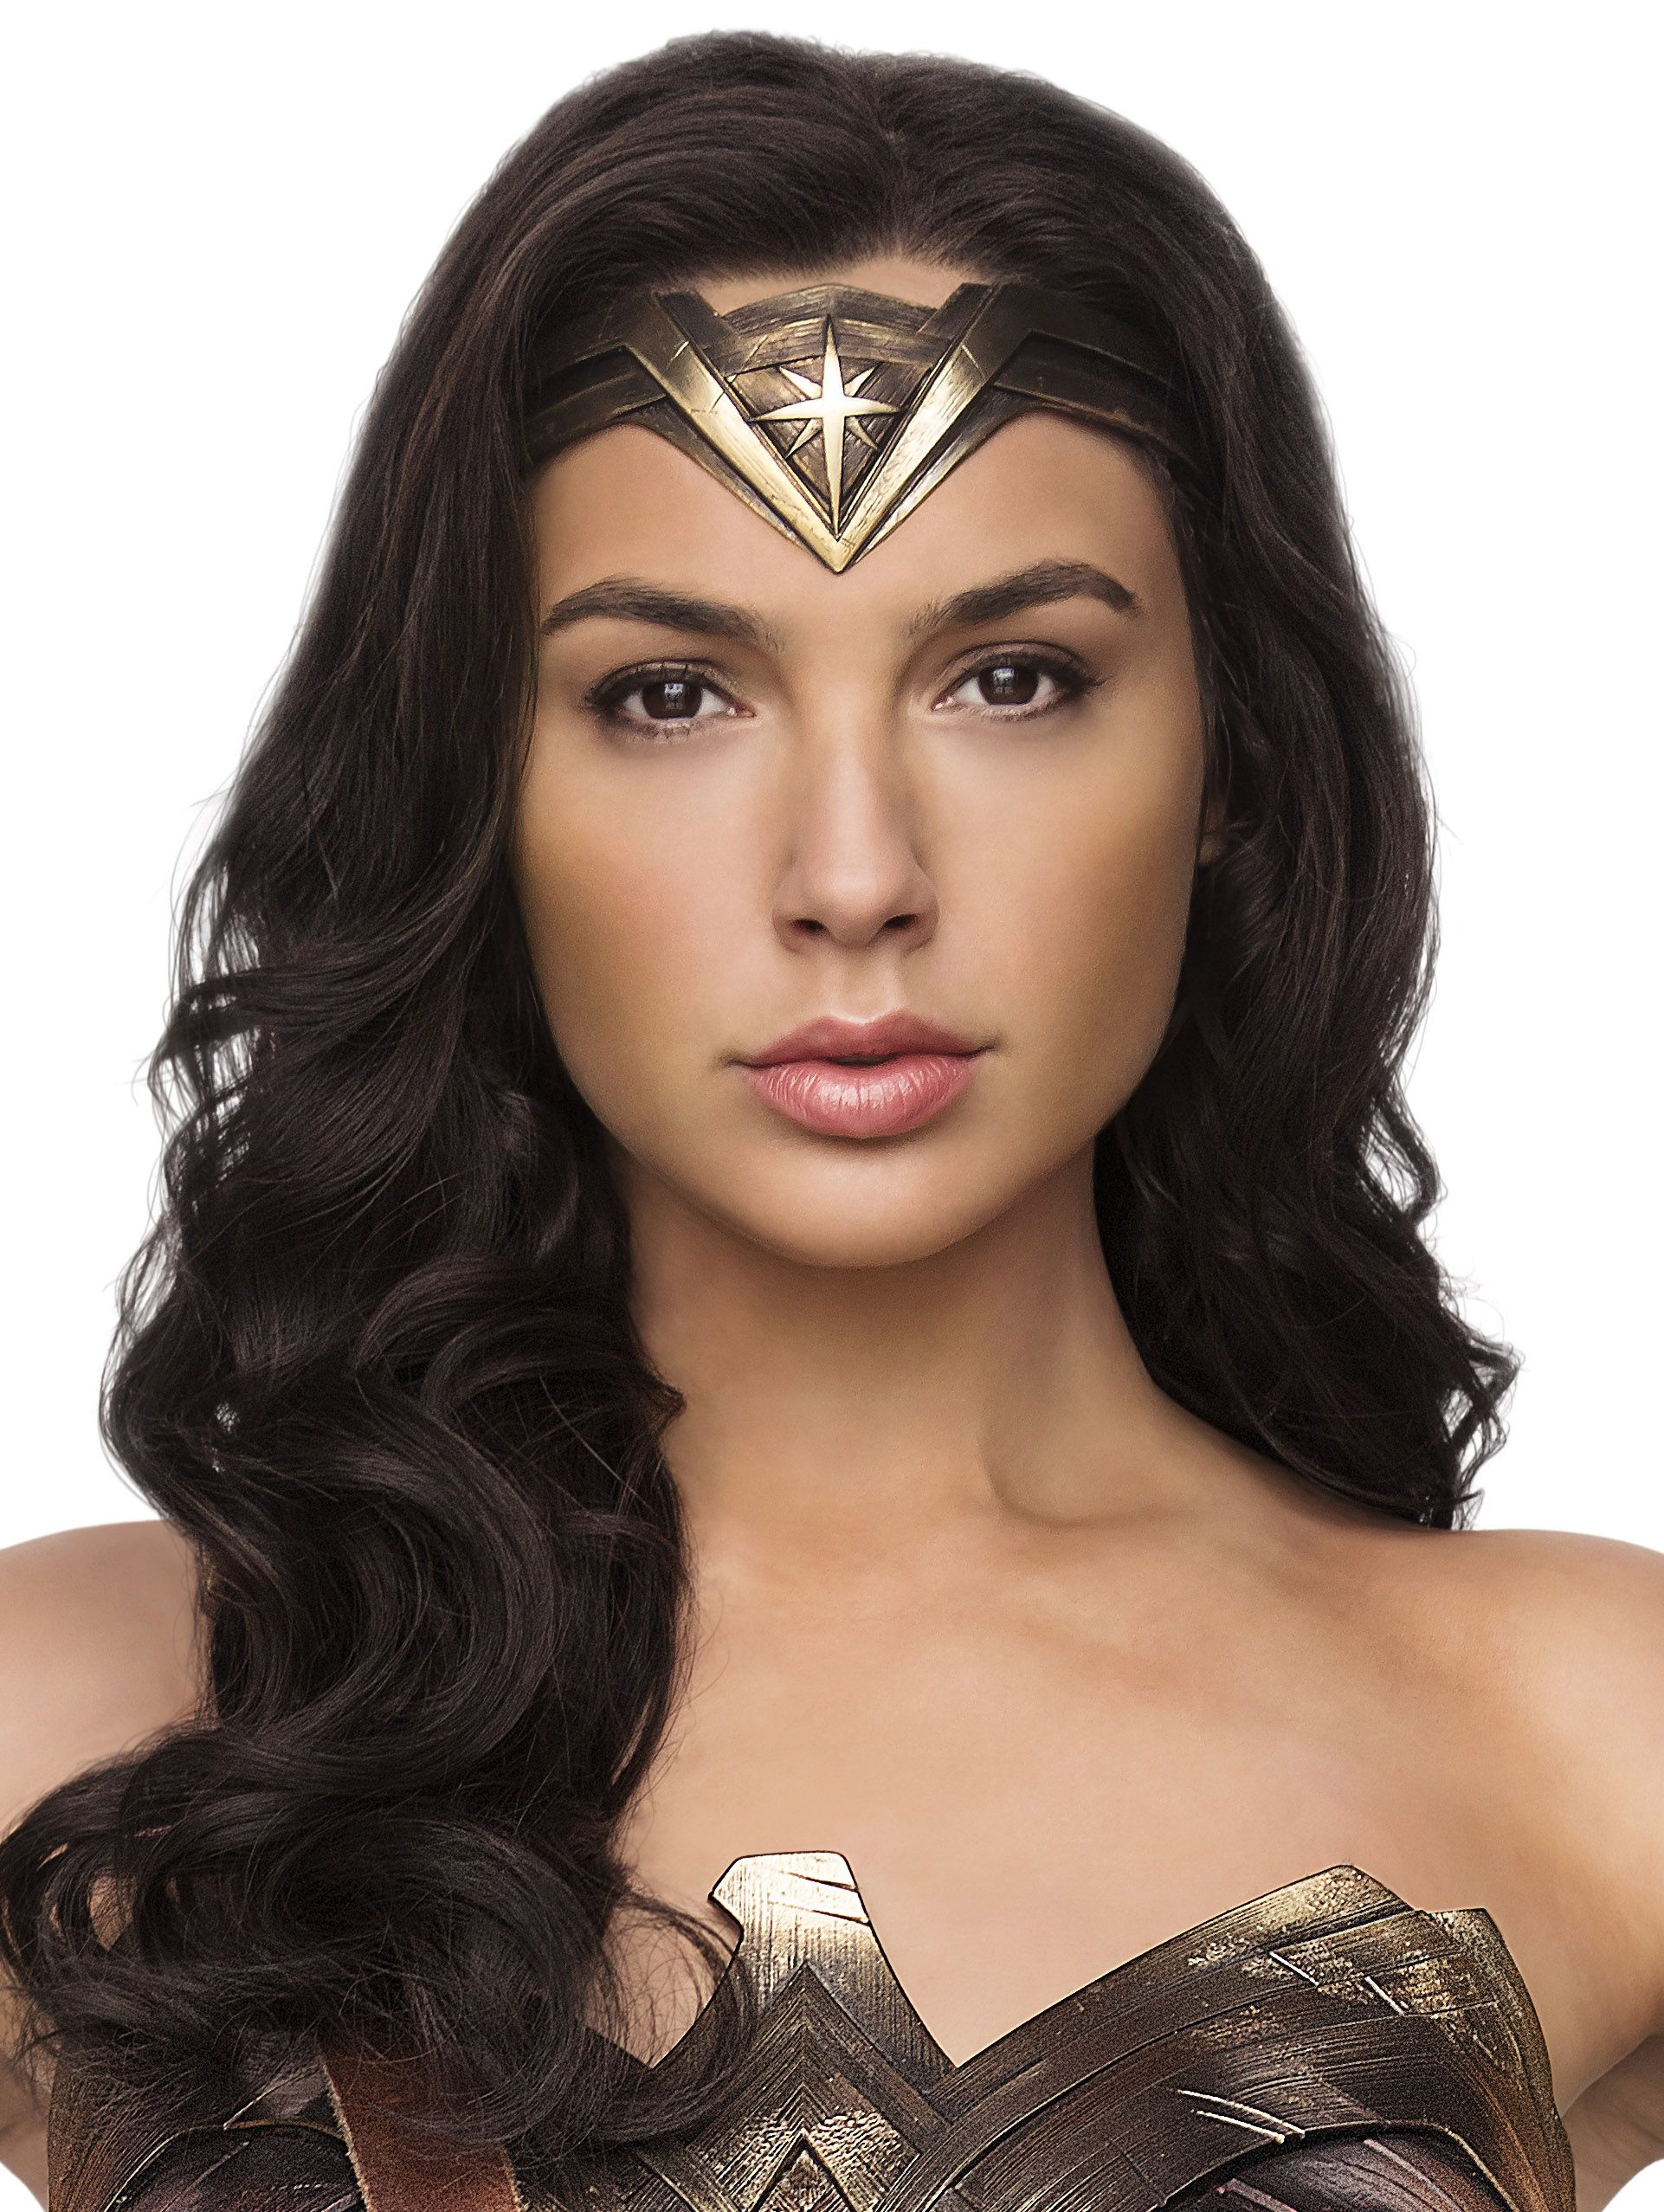 Pin By Kristi Pope On 1 Wonder Woman In 2020 Gal Gadot Wonder Woman Wonder Woman Art Gal Gadot